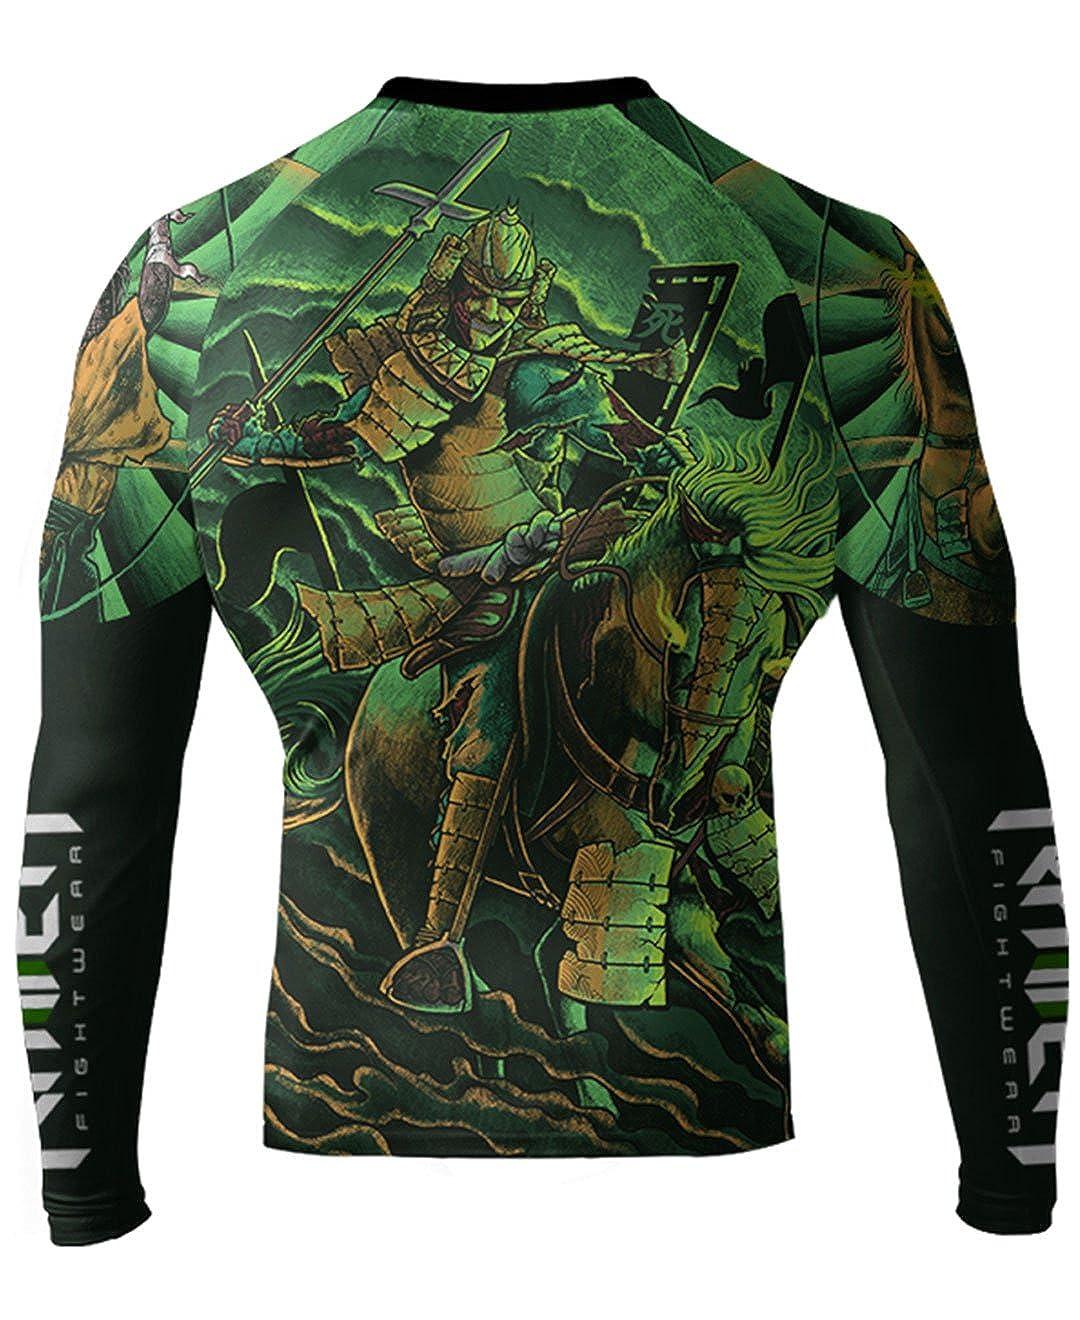 Raven Fightwear Mens Horsemen of The Apocalypse Death Samurai Rash Guard RF106-0001